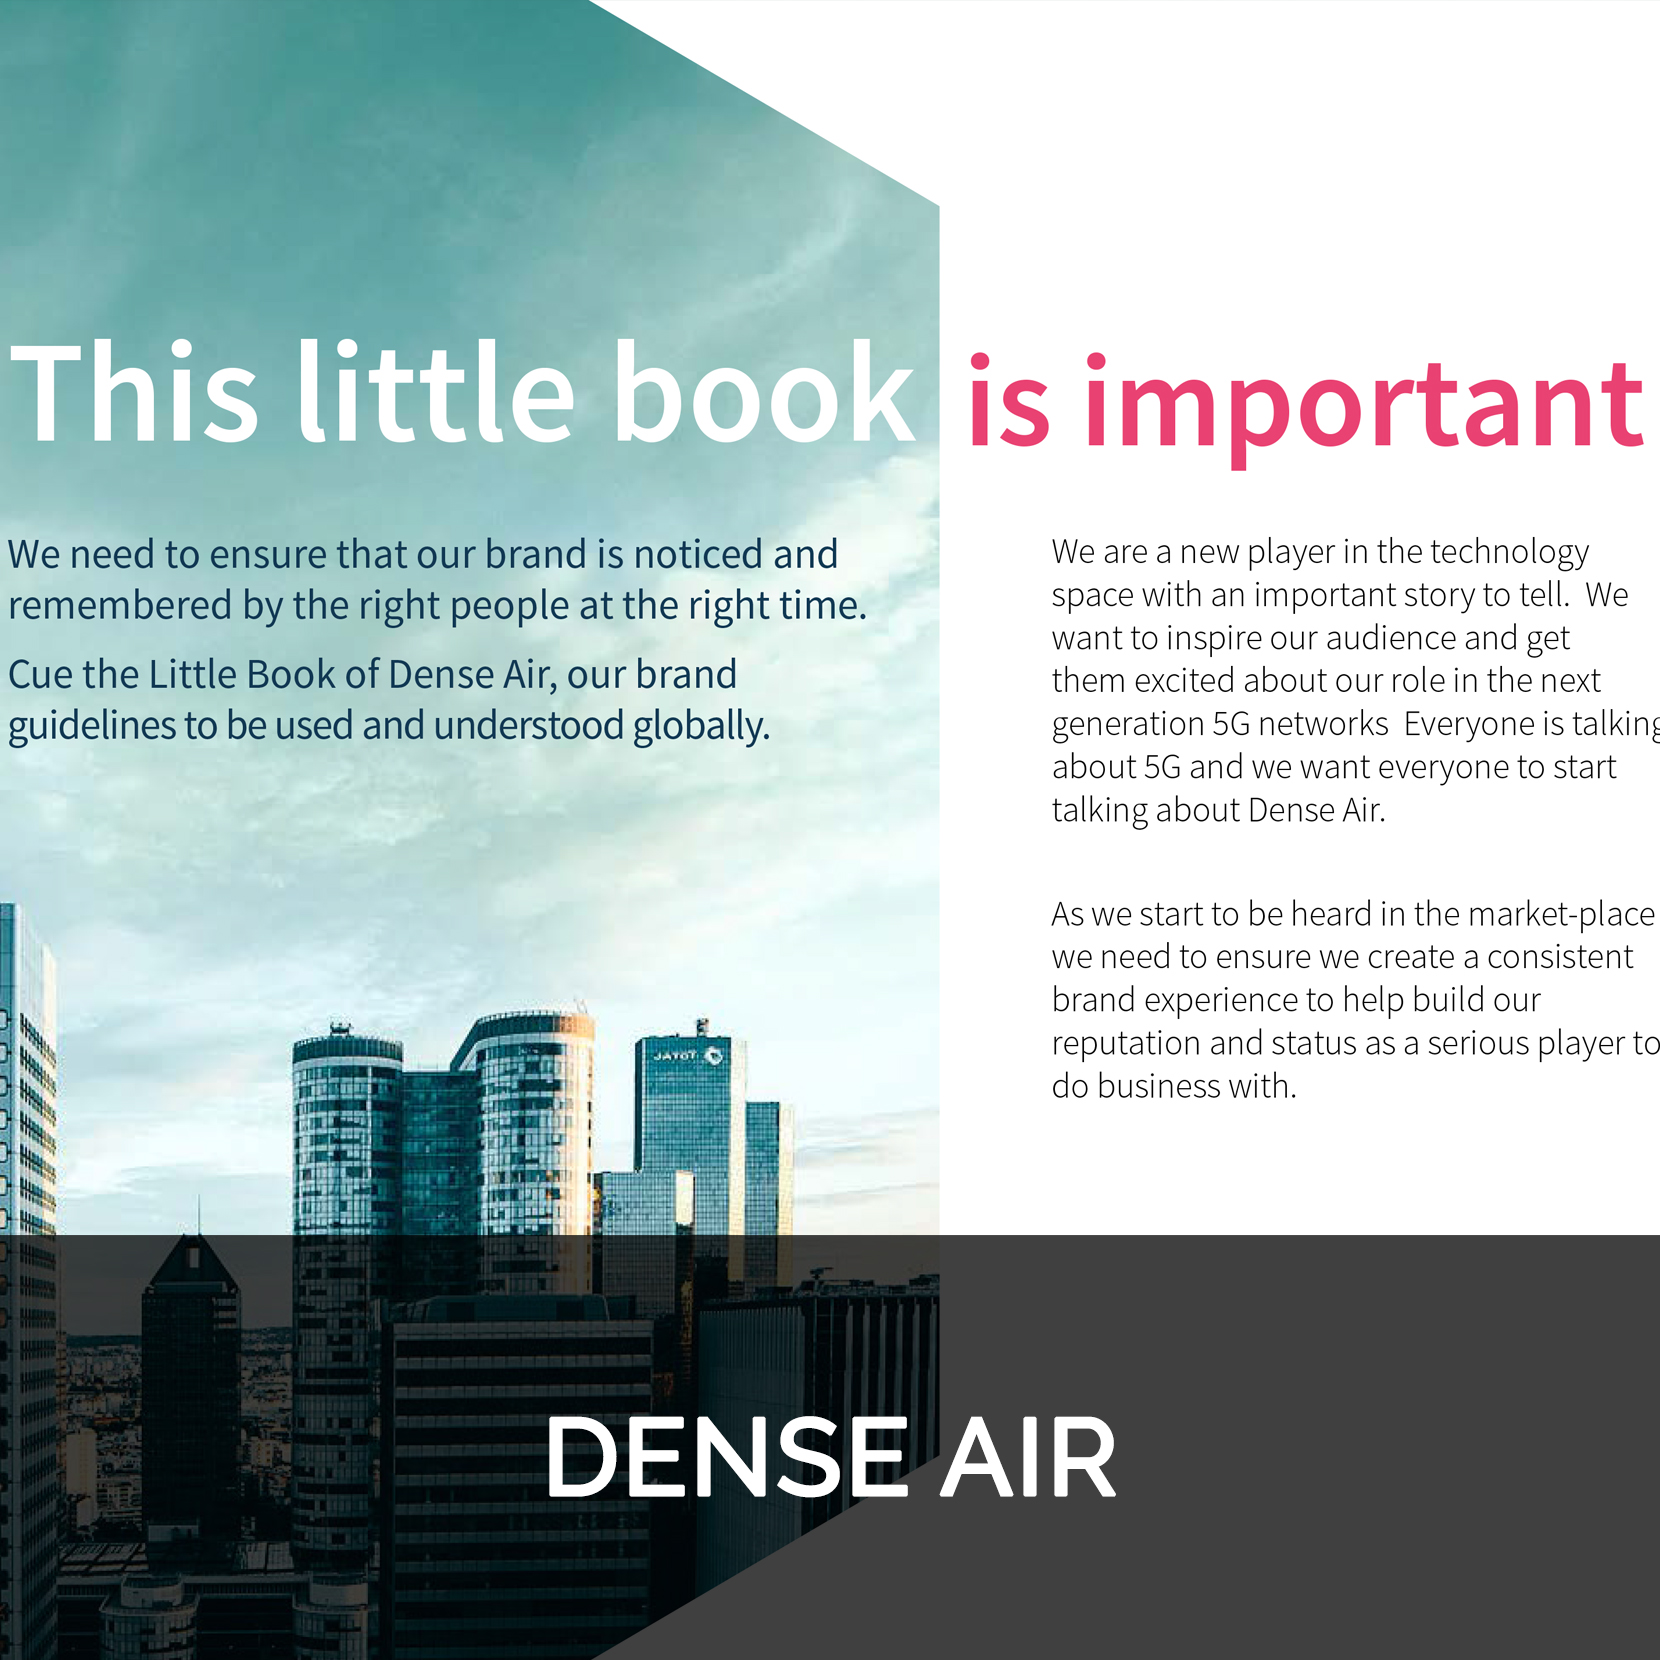 https://rusyndesign.co.uk/wp-content/uploads/2015/04/Work-square-Dense-Air.jpg